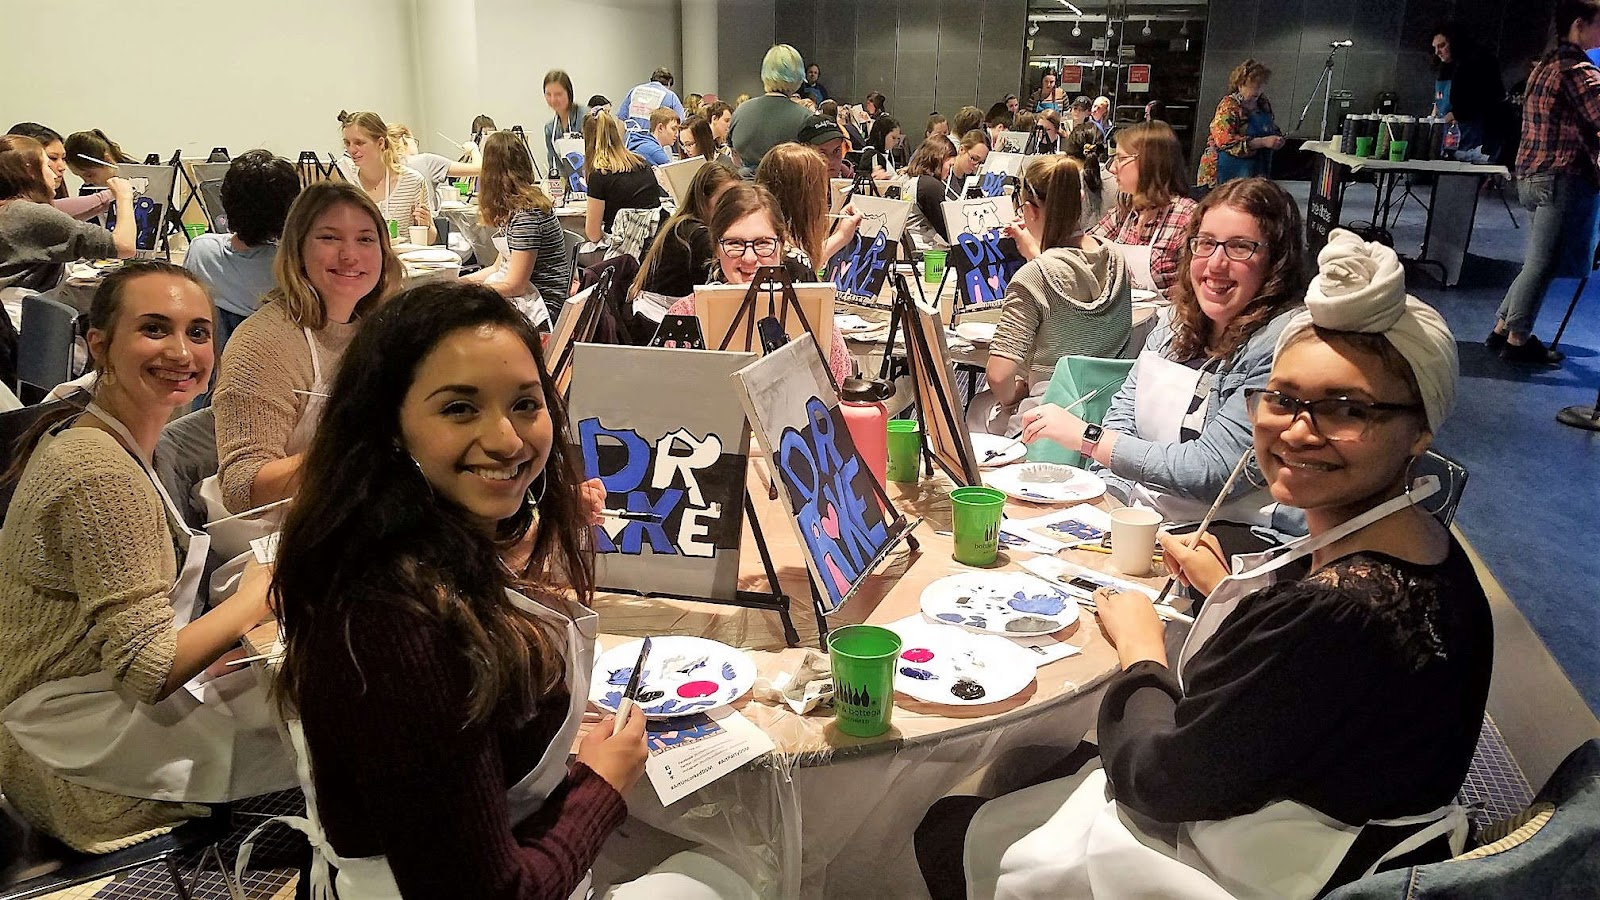 Drake University students painting mascot